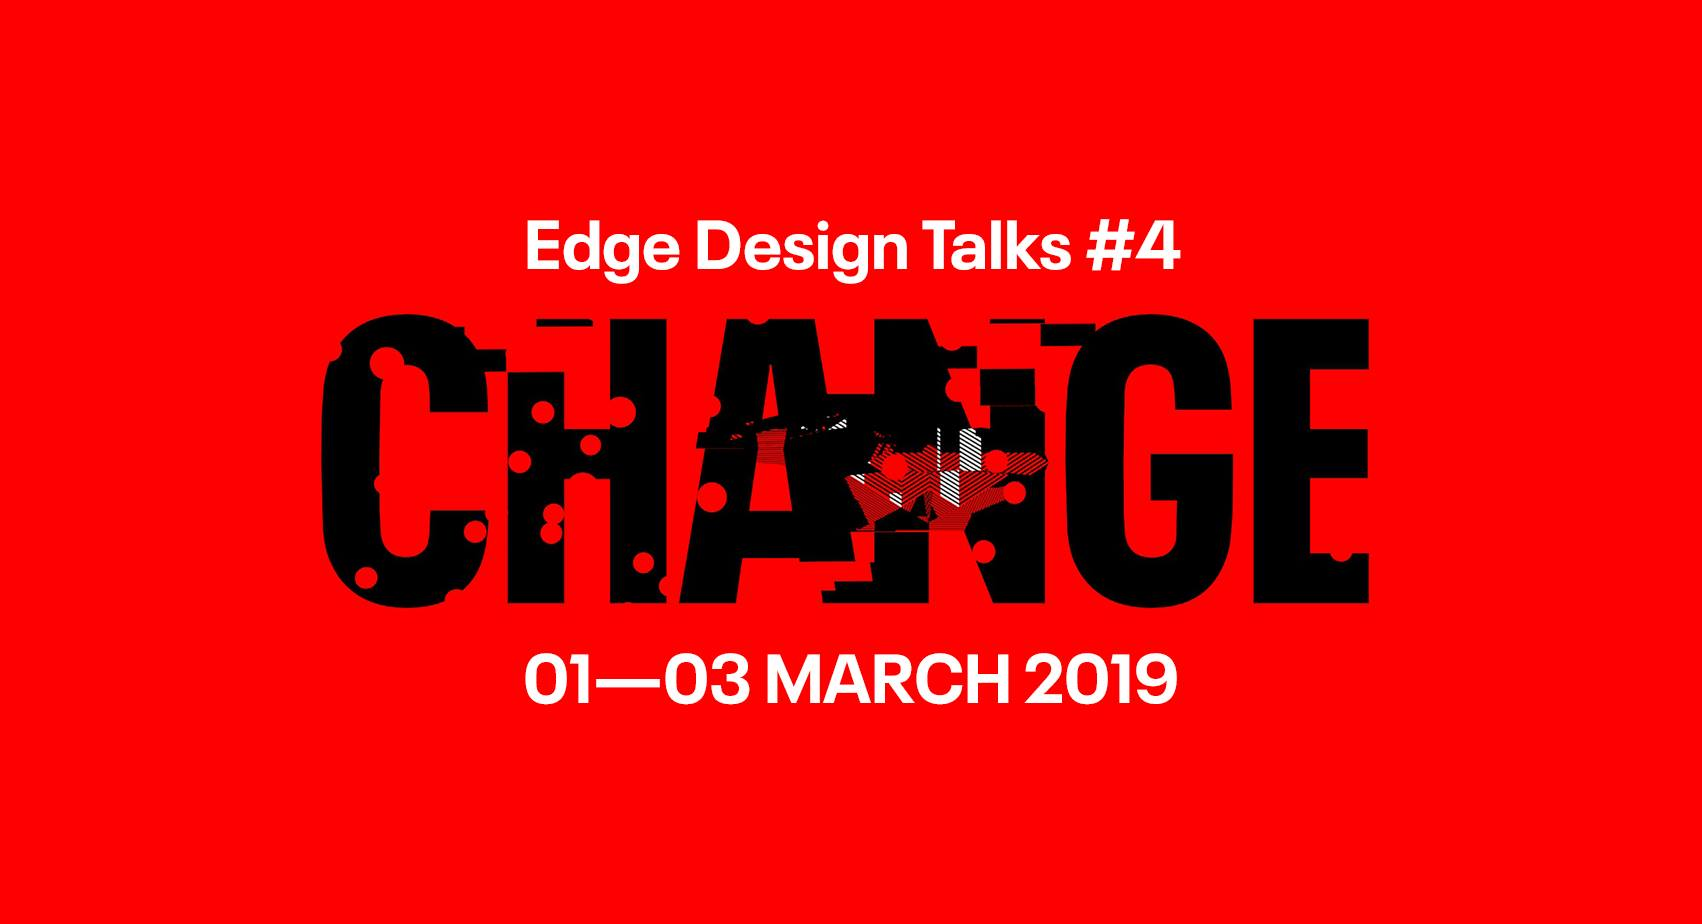 Edge Design Talks #4 – Workshops